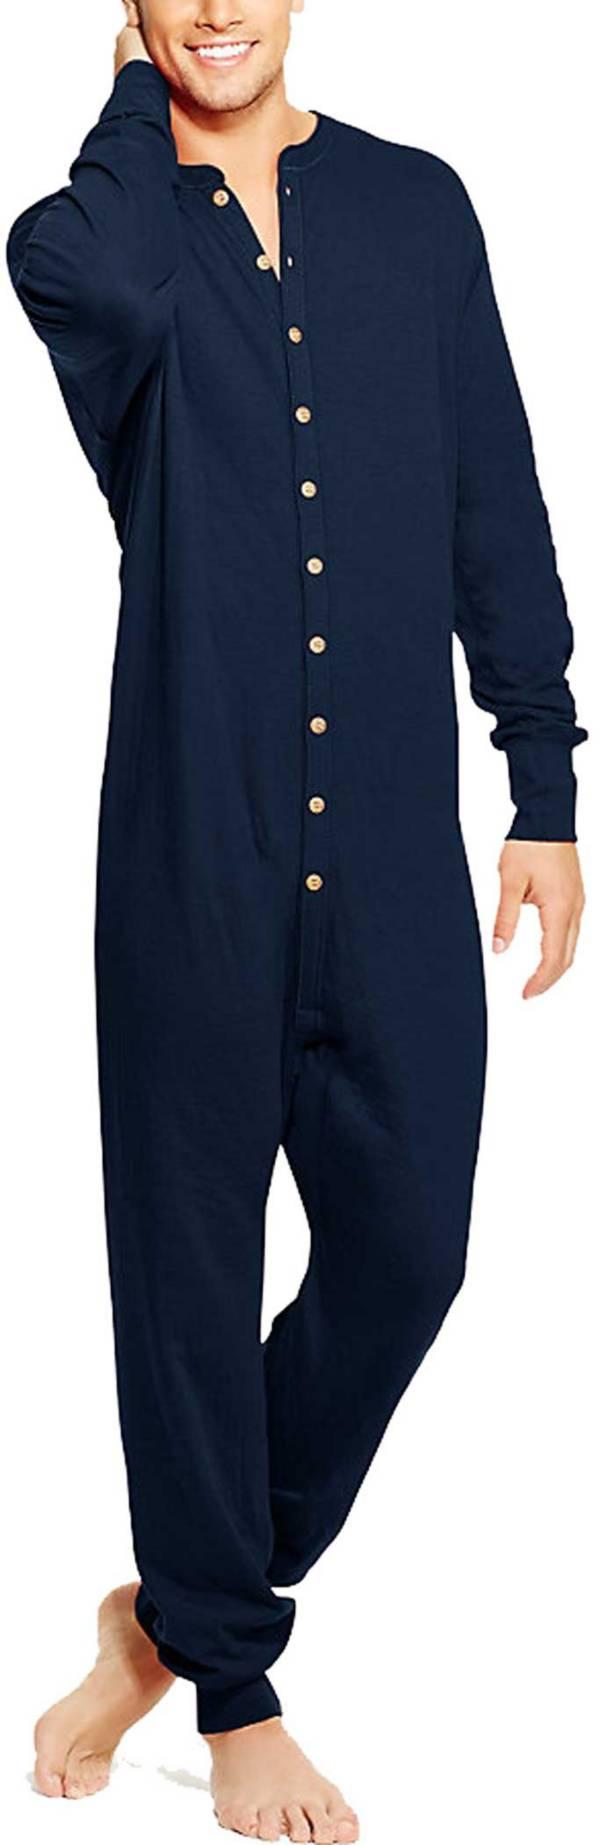 Duofold Men's Wool Blend Union Suit product image